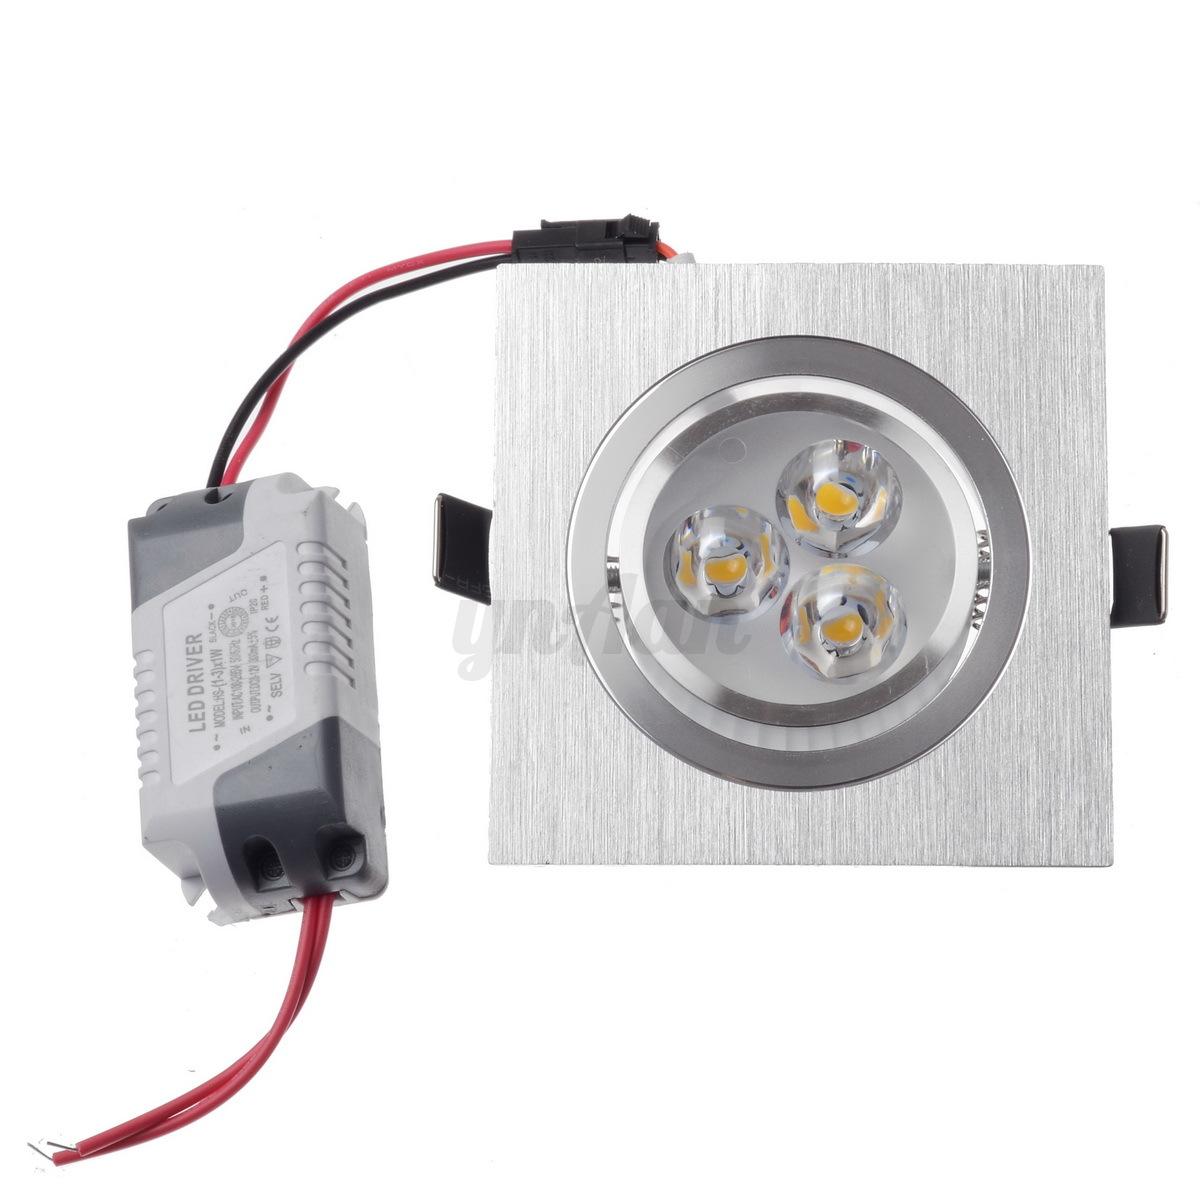 220V 3/5W Recessed LED Ceiling Downlight Spotlight Lamp